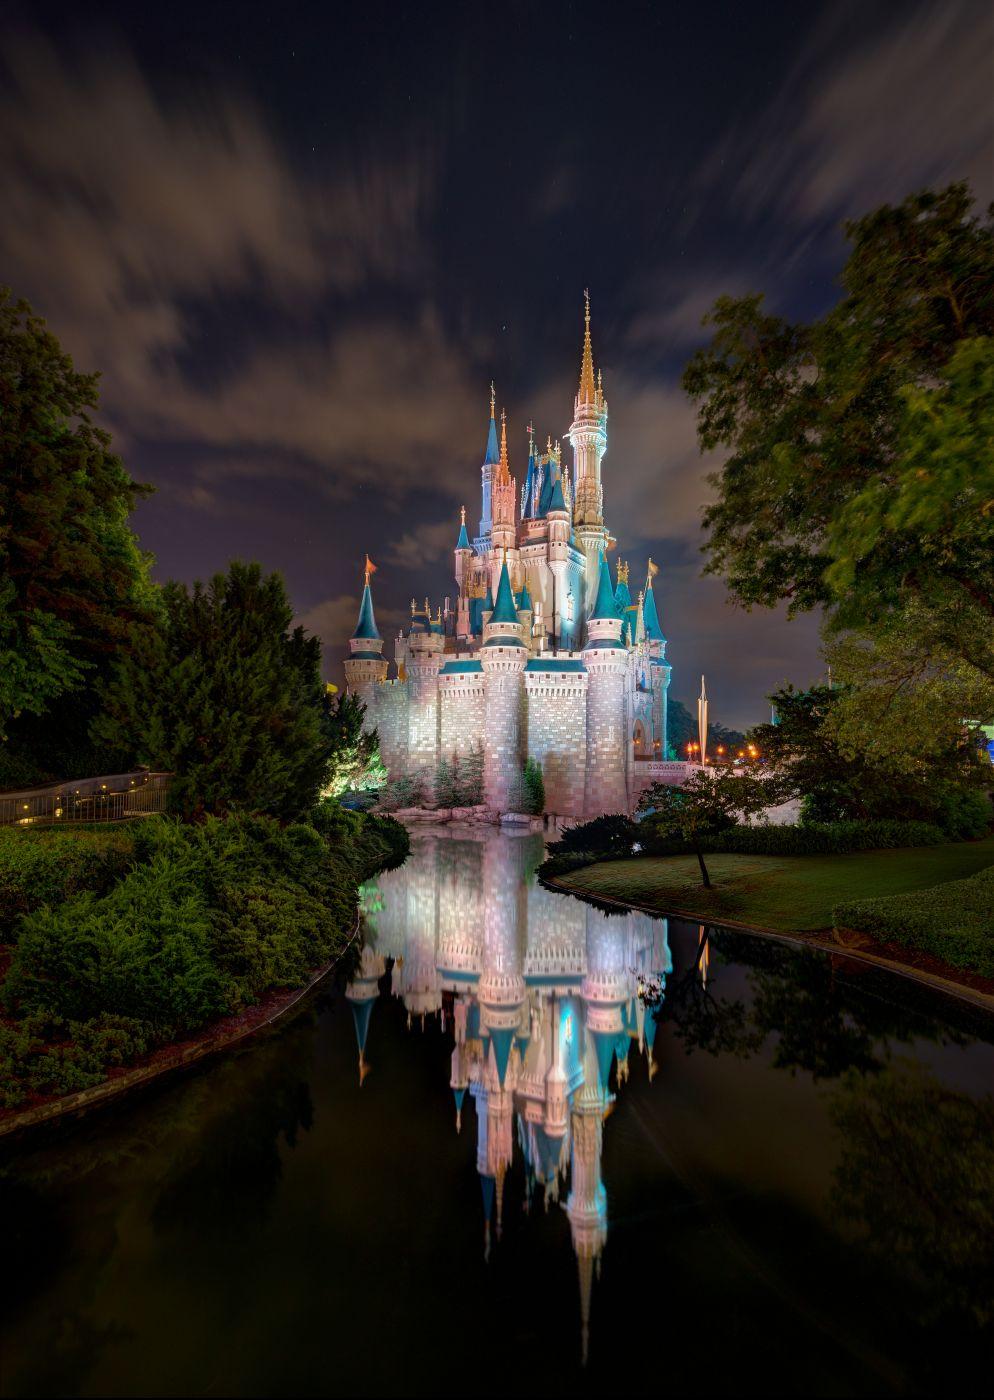 Cinderella Castle, USA